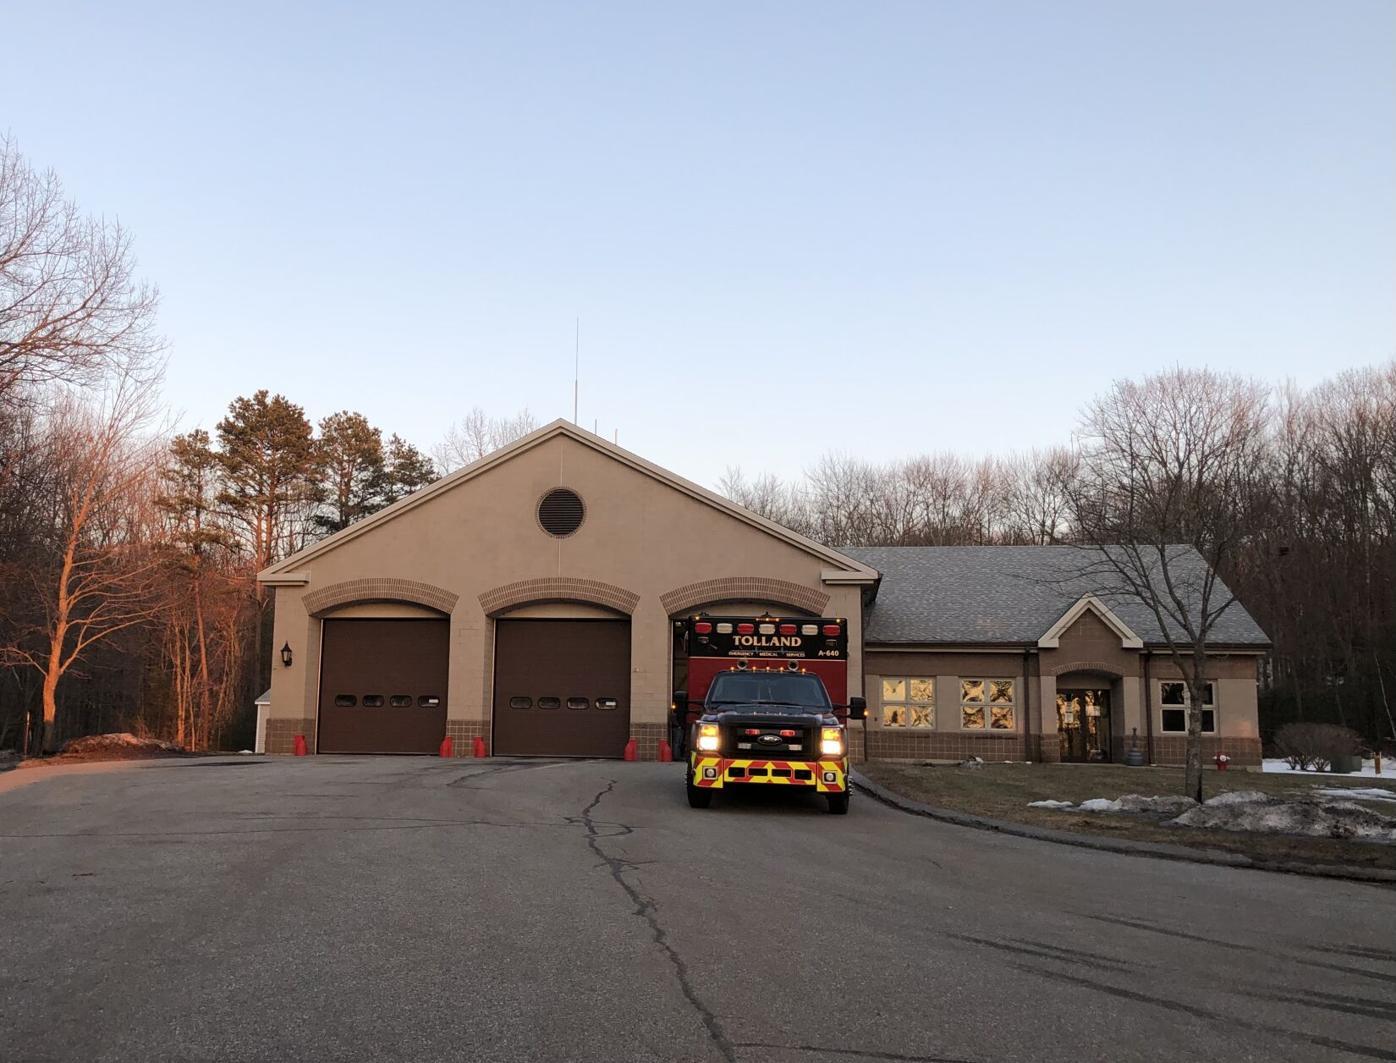 Tolland Fire House 01.jpg